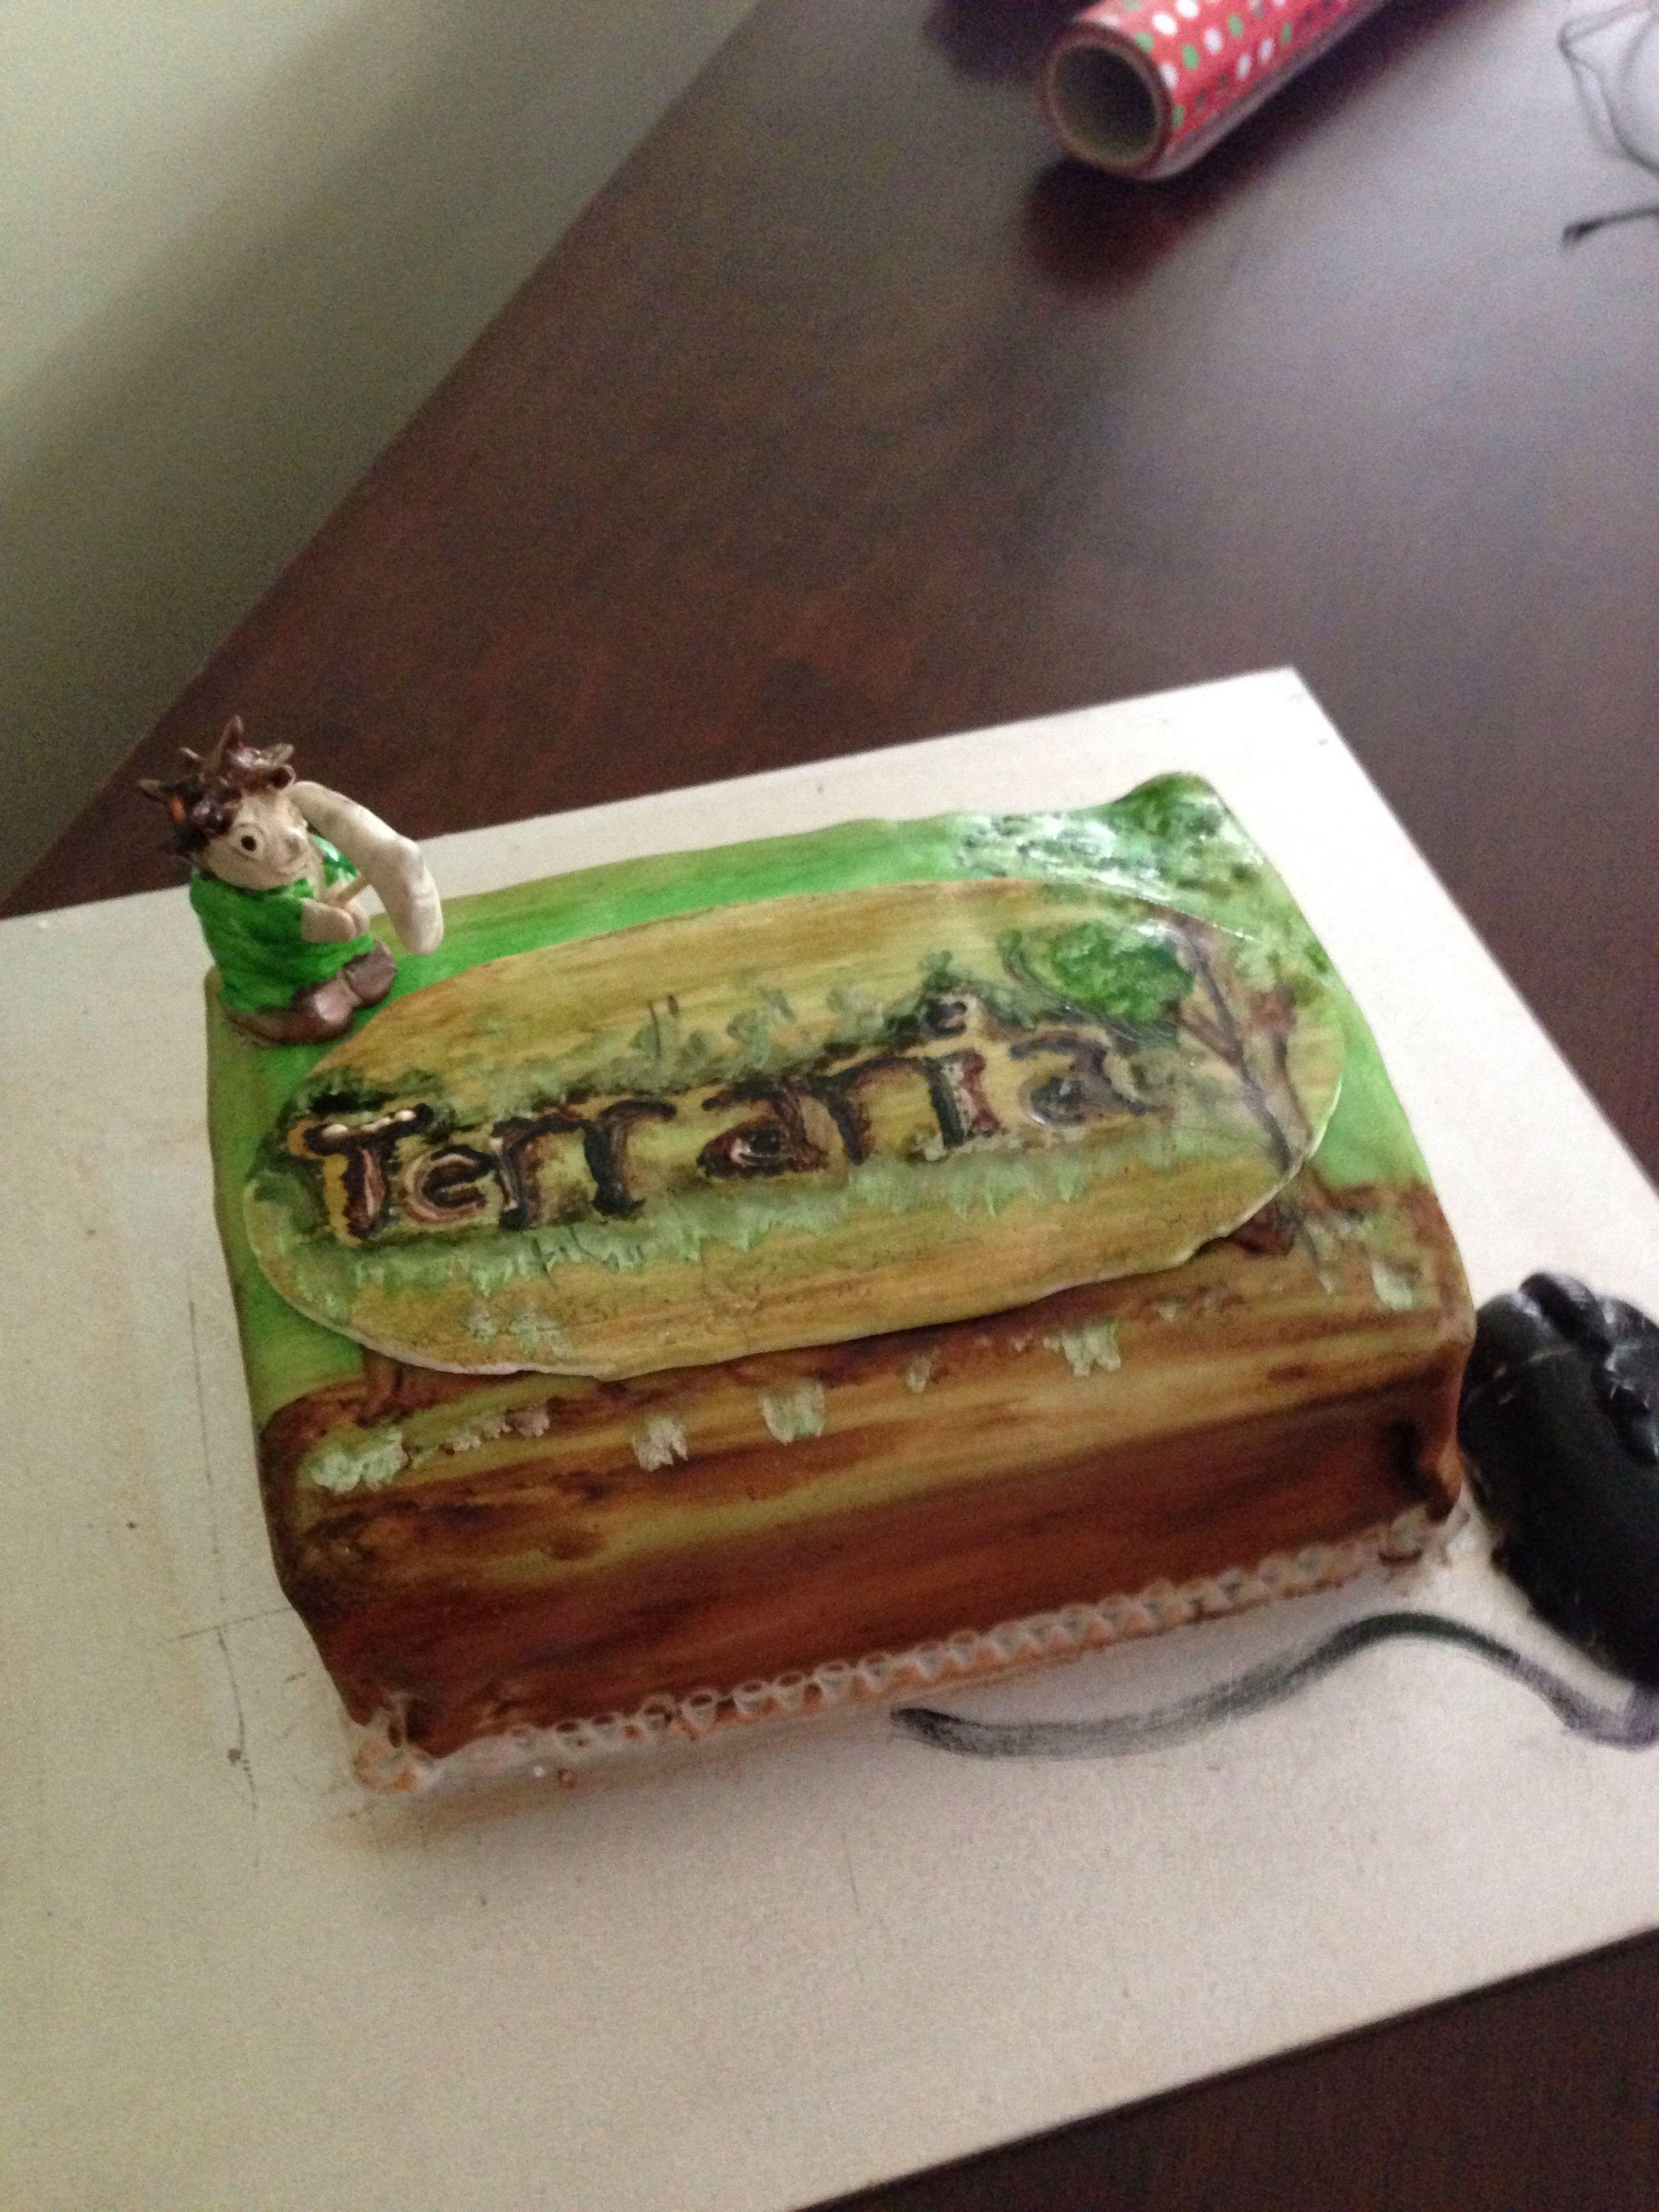 Sam S Birthday Cake Terraria Inspired